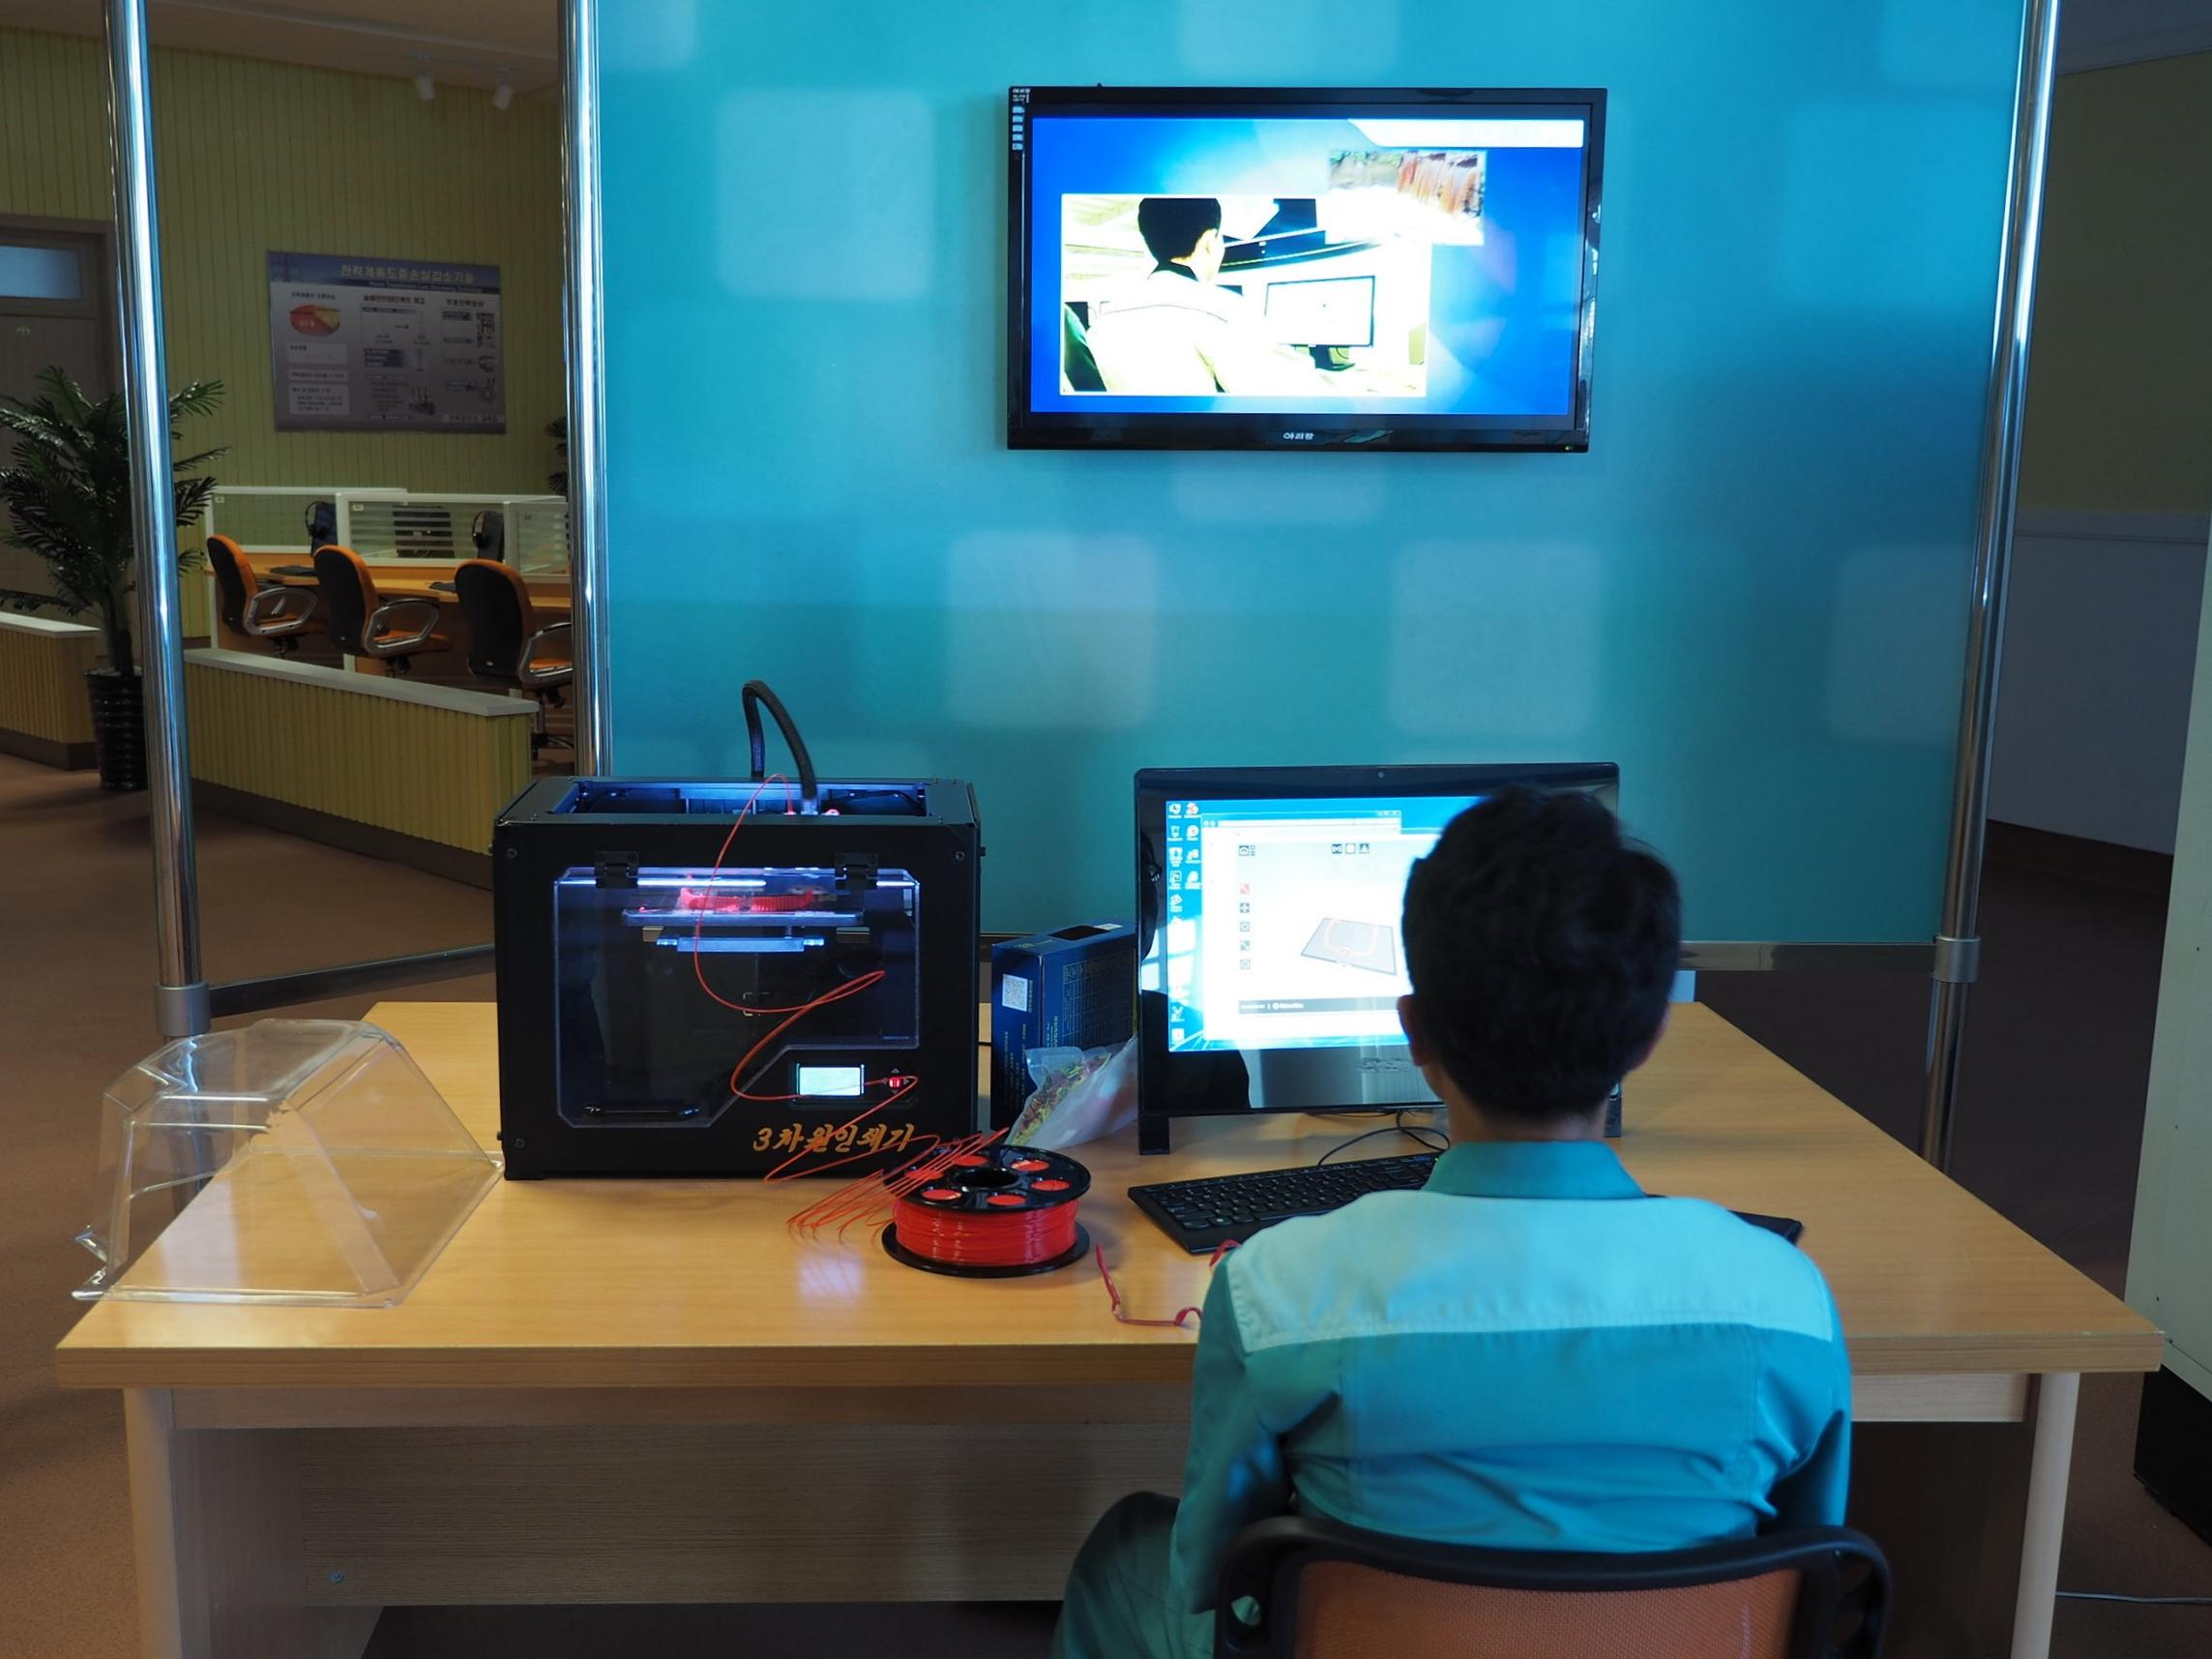 MakerBot 3D printer, rebranded as North Korean innovation.